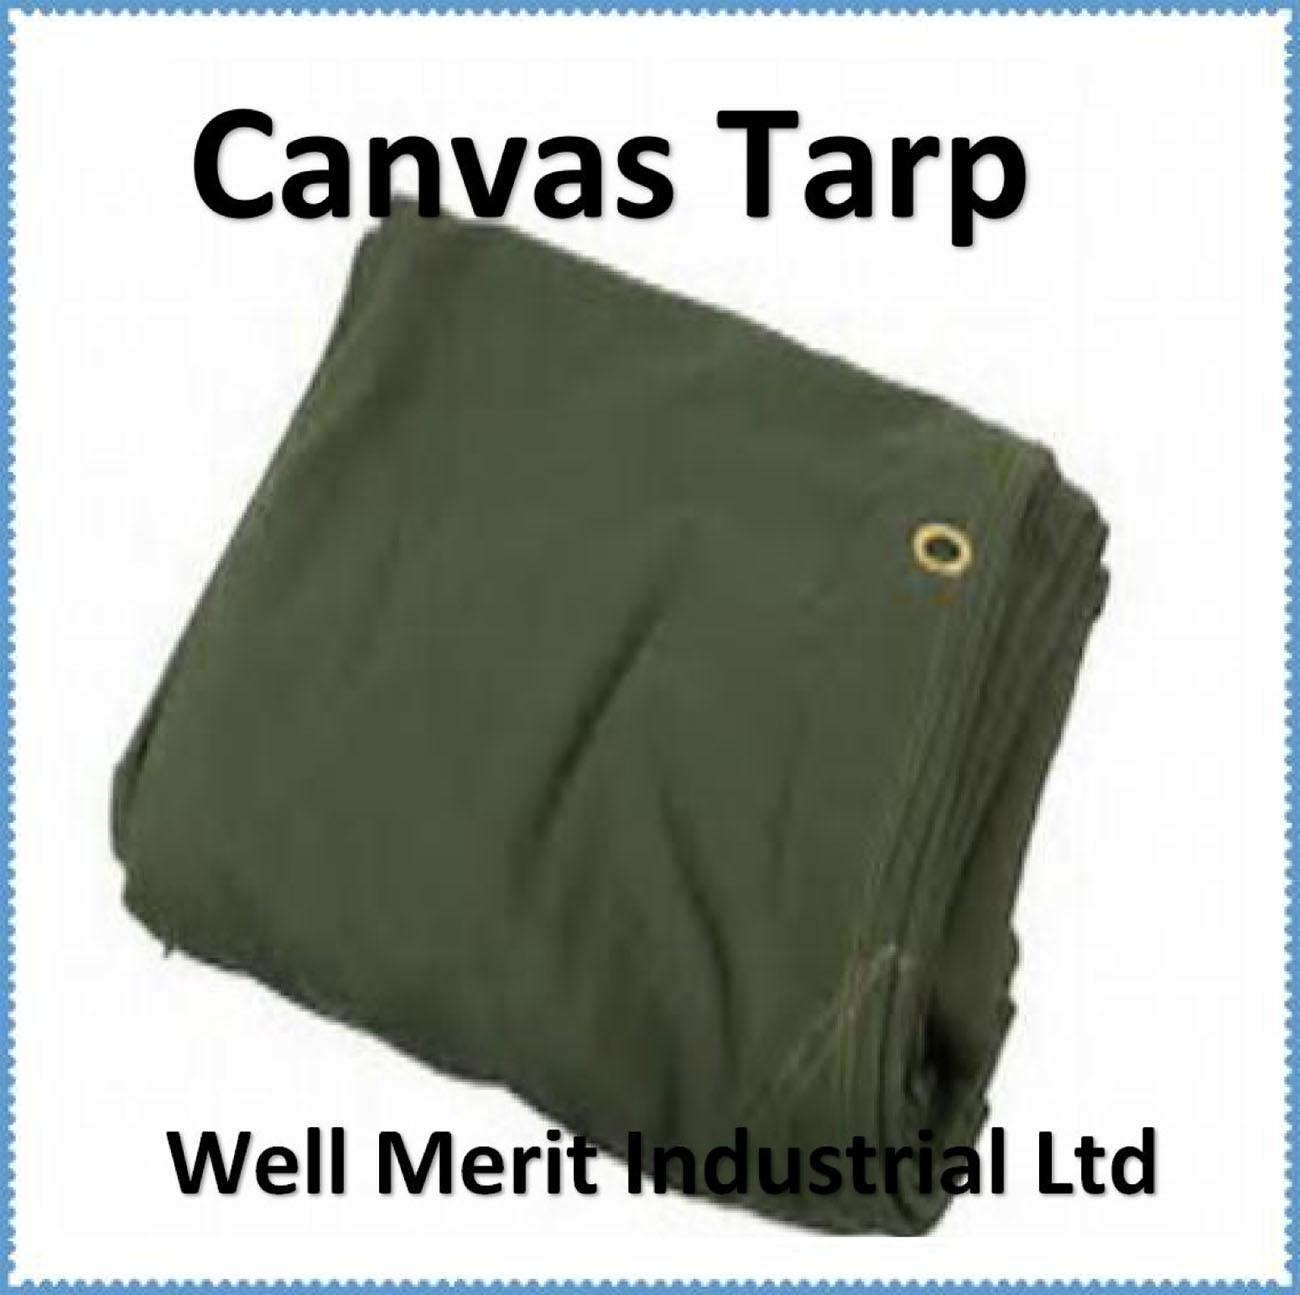 Water Resistant 10/' x 12/' Canvas Tarp 16 oz Heavy Duty